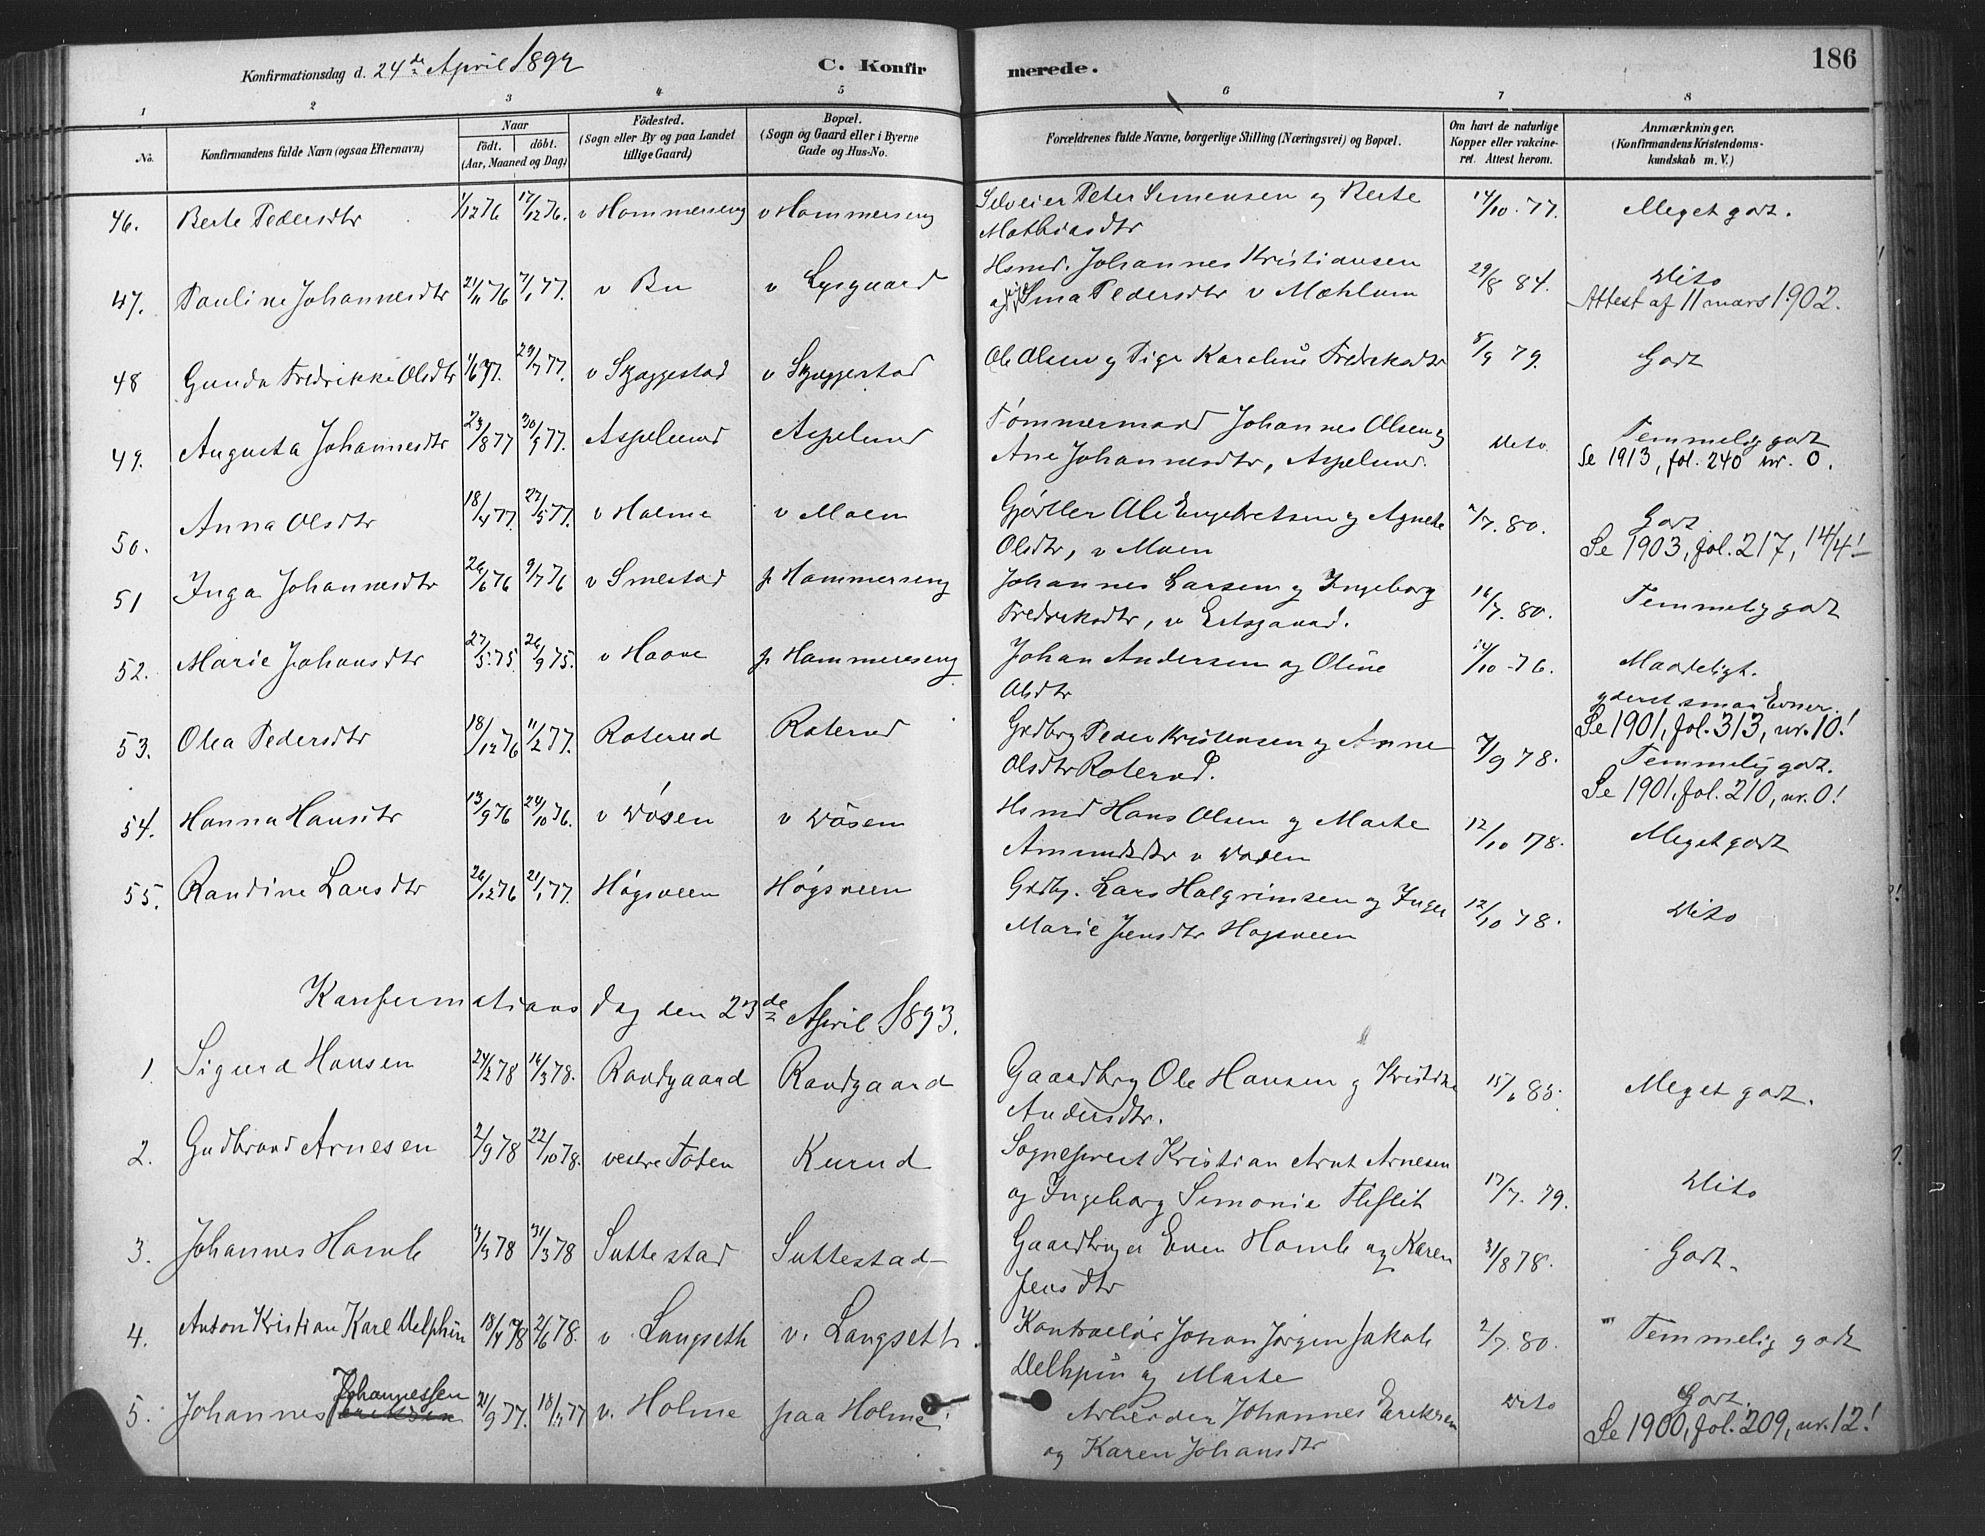 SAH, Fåberg prestekontor, Ministerialbok nr. 9, 1879-1898, s. 186